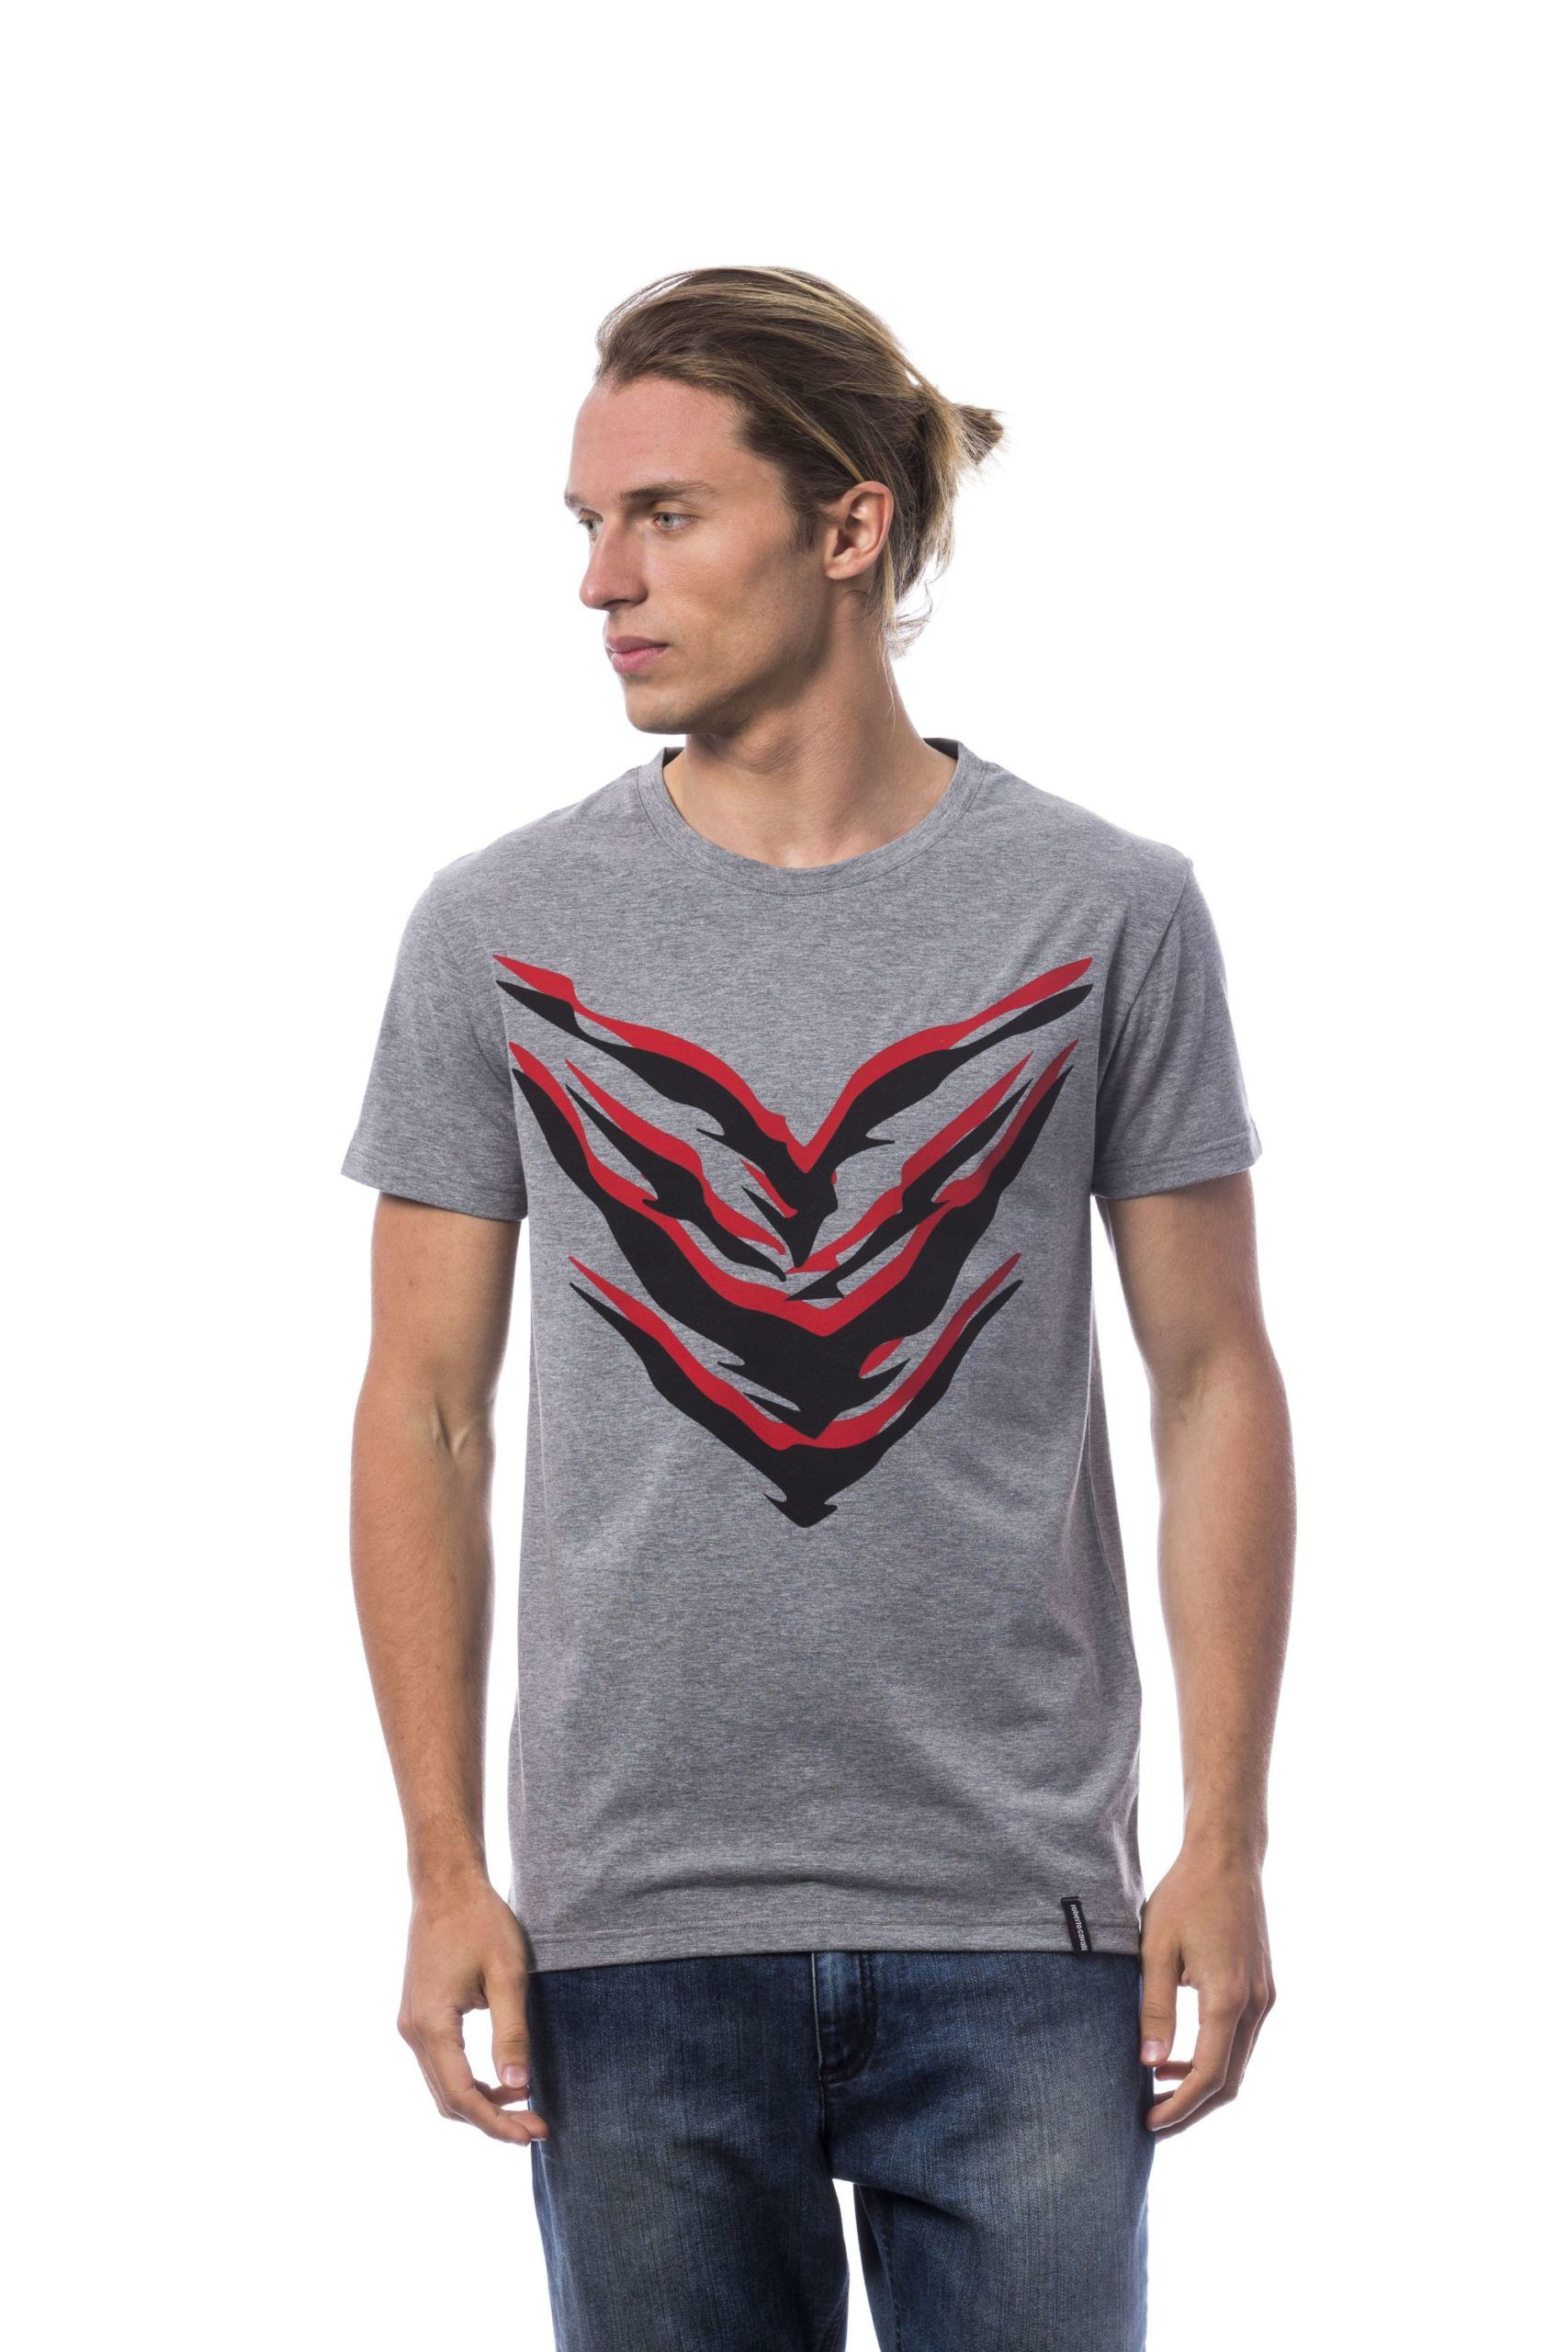 Roberto Cavalli Sport Grey Melange T-shirt